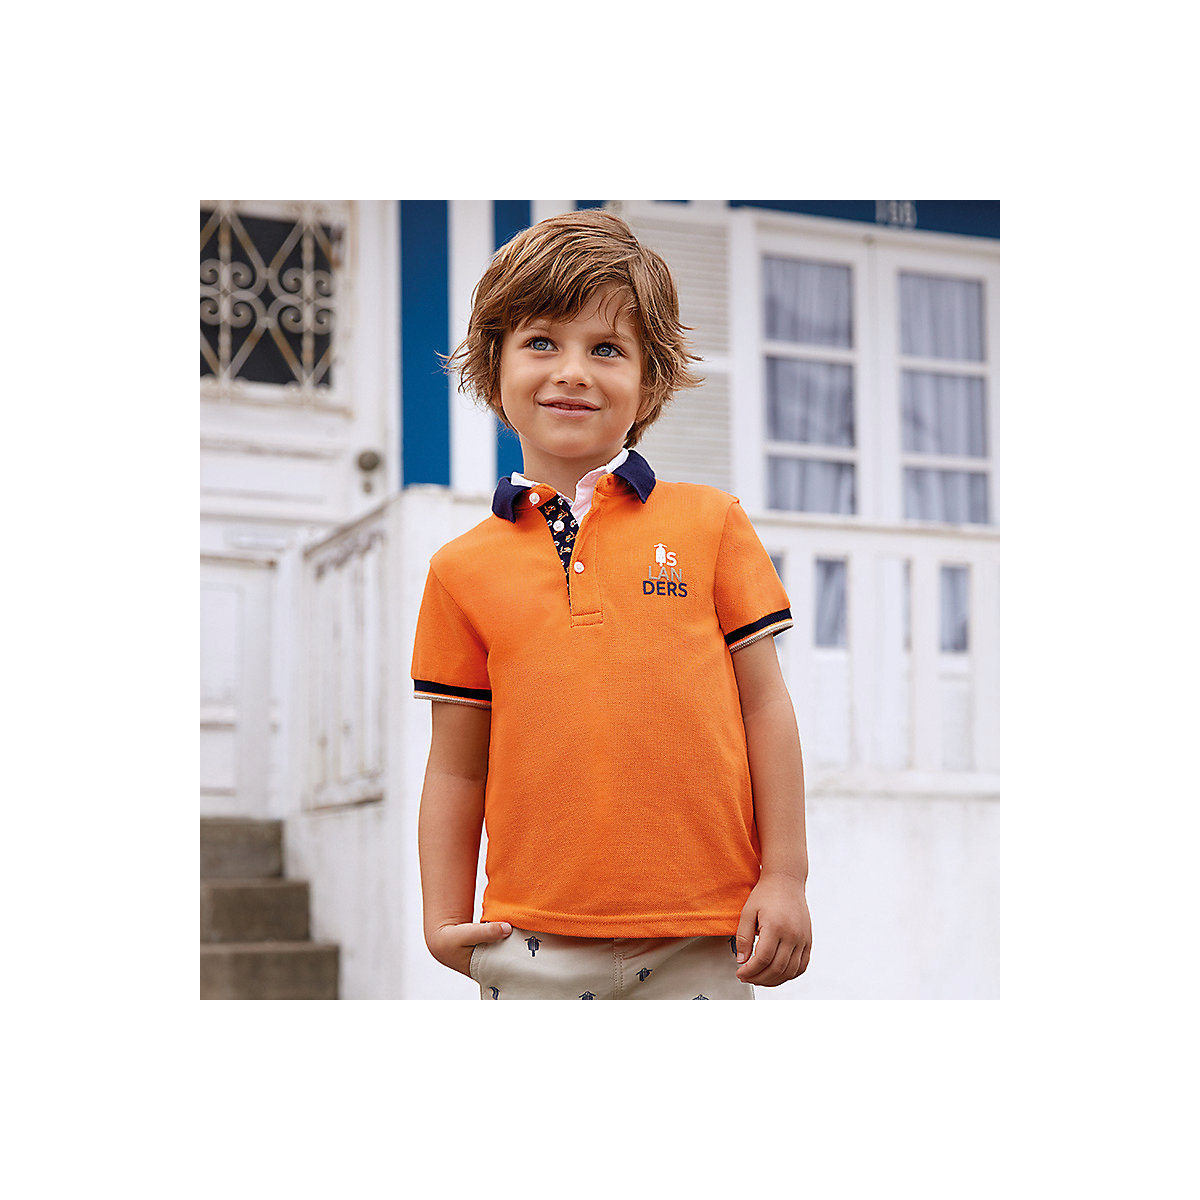 MAYORAL Polo Shirts 10690872 children clothing t-shirt shirt the print for boys